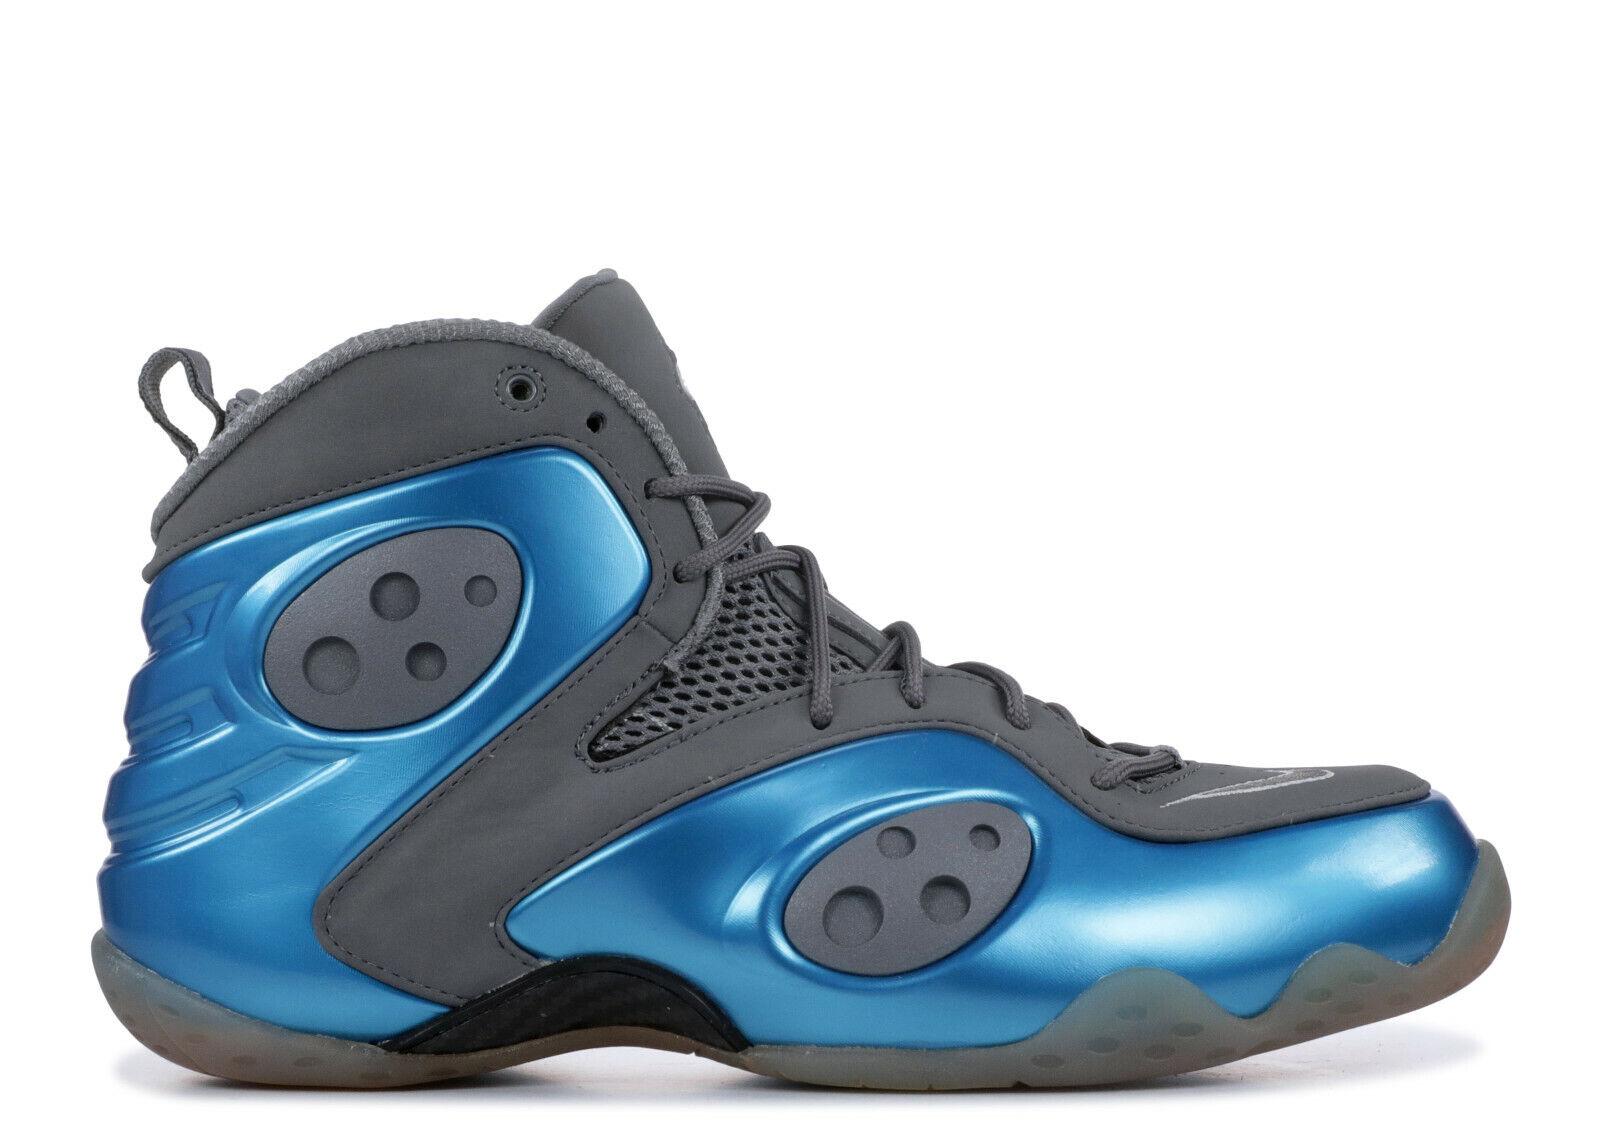 2012 Nike Zoom Rookie Foamposite SZ 11 Dynamic blu Penny Galaxy OG 472688-402